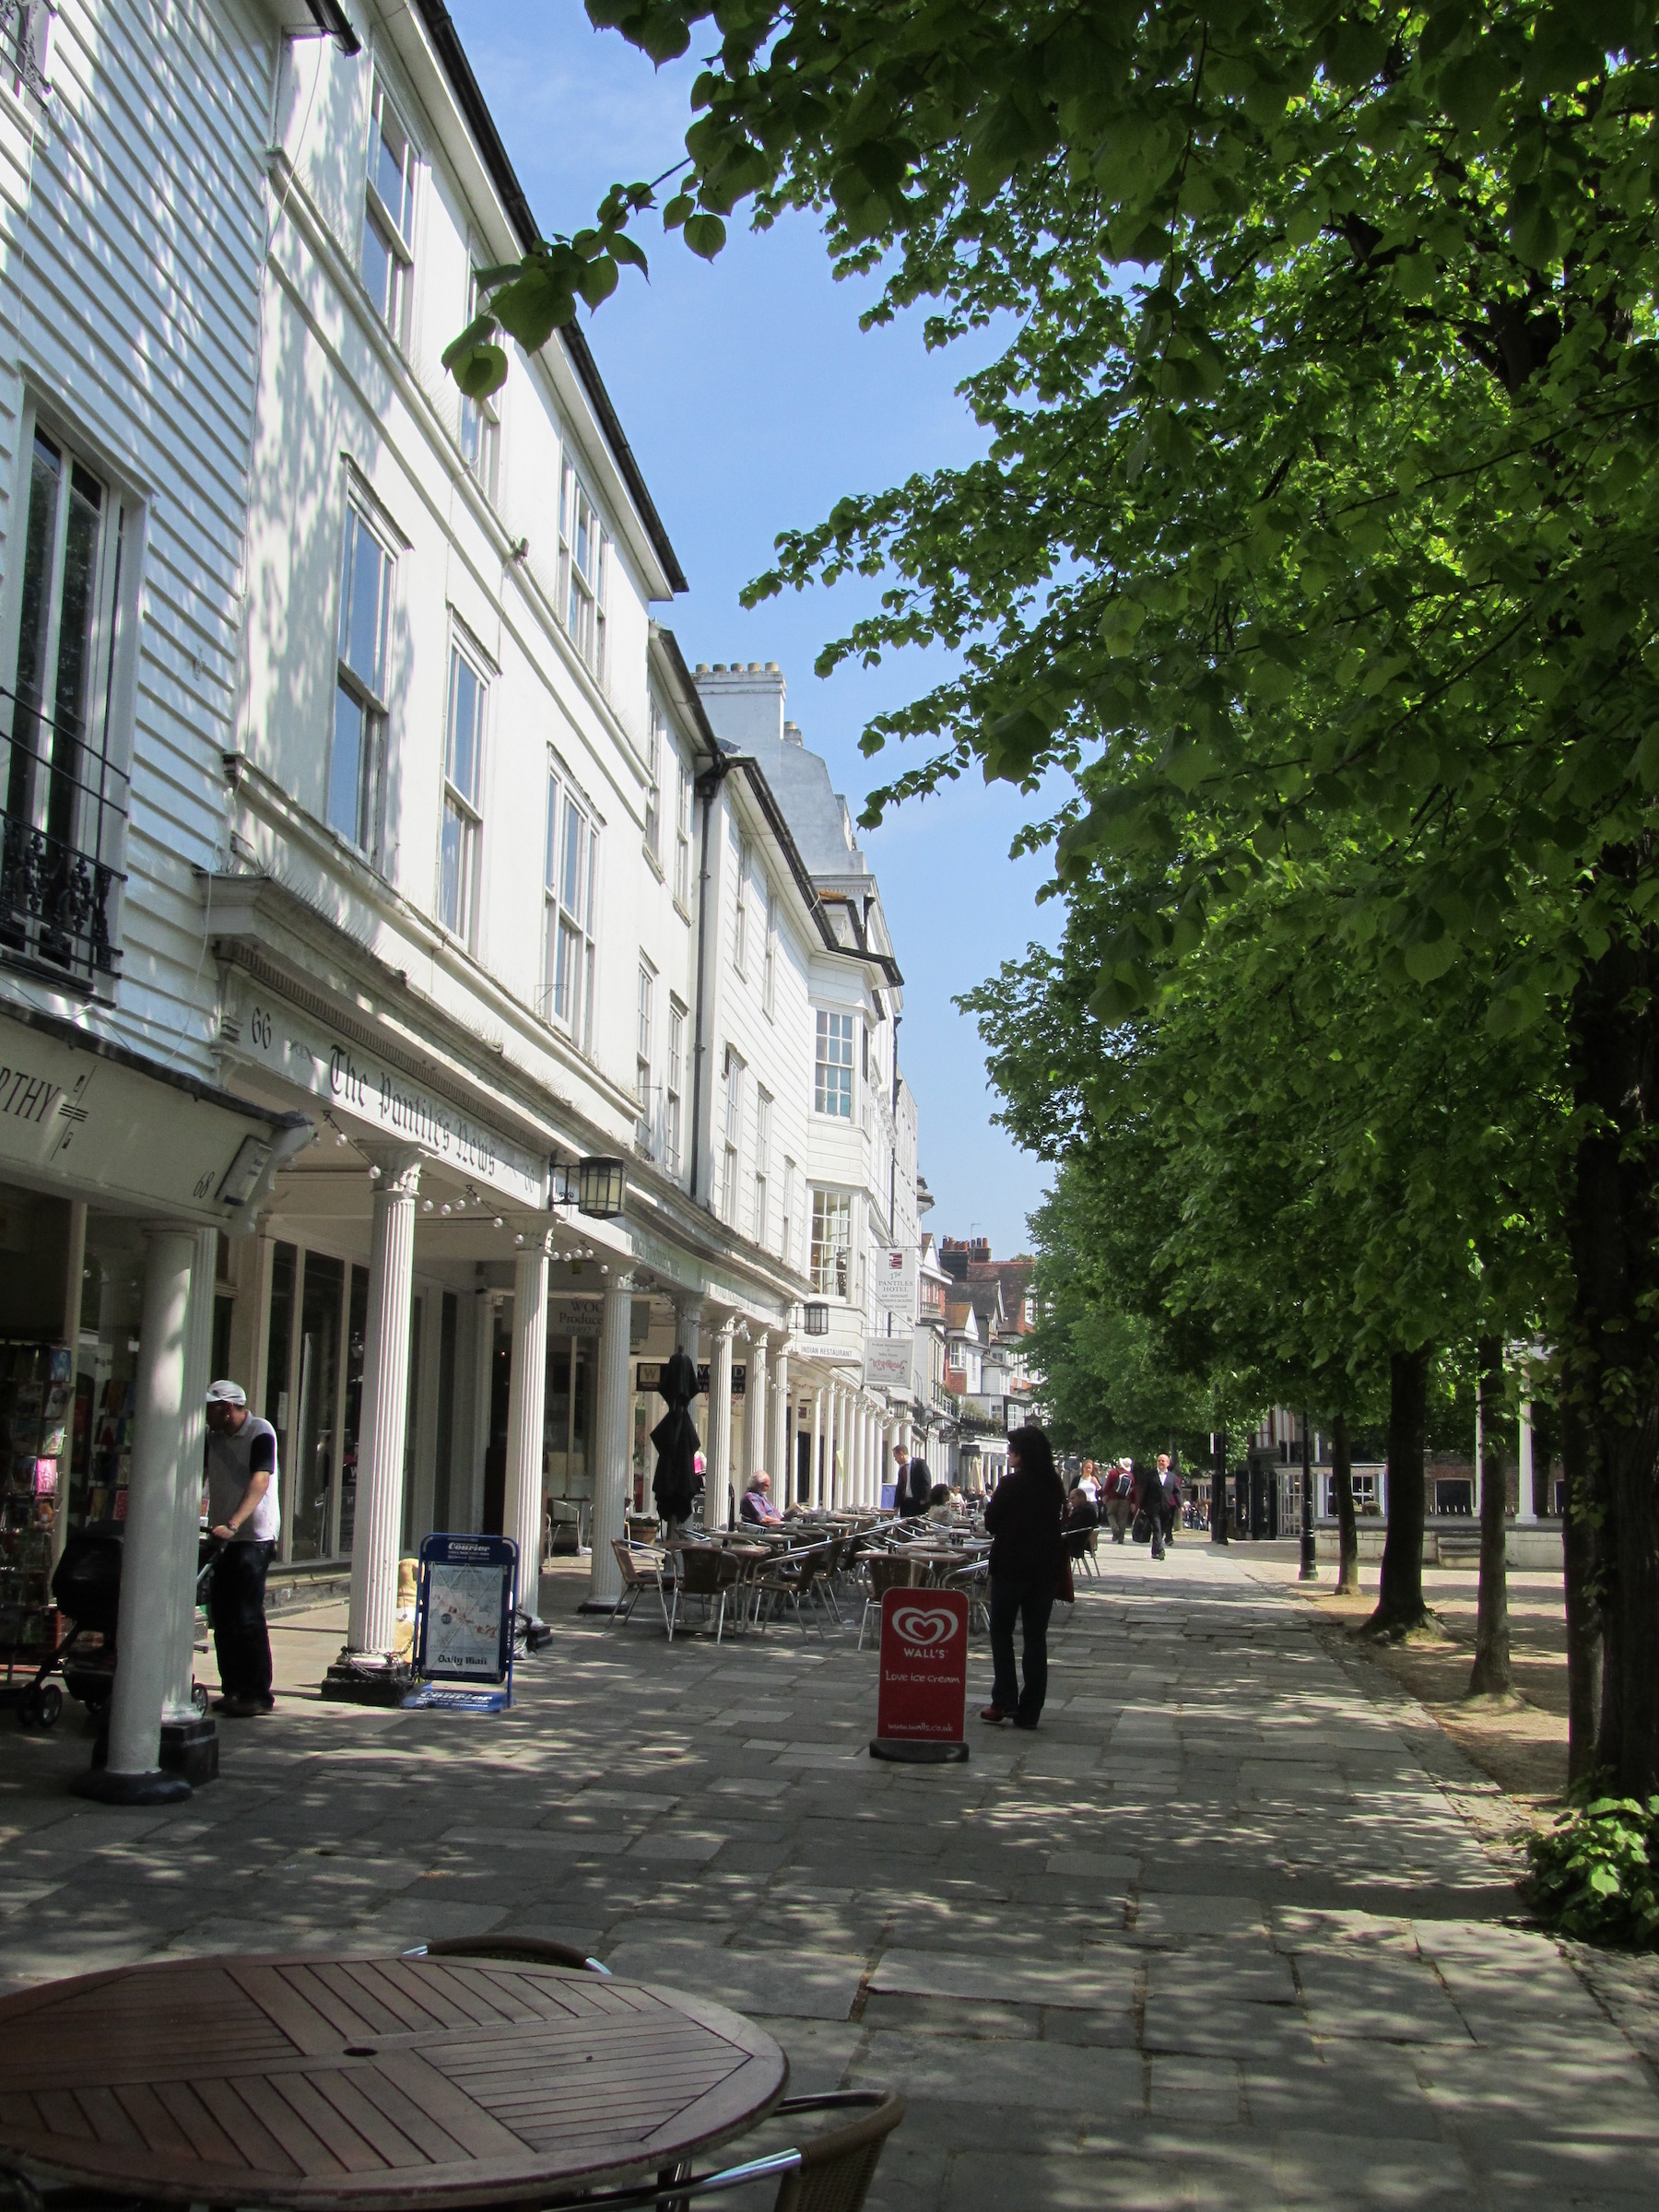 Tunbridge Wells, Kent